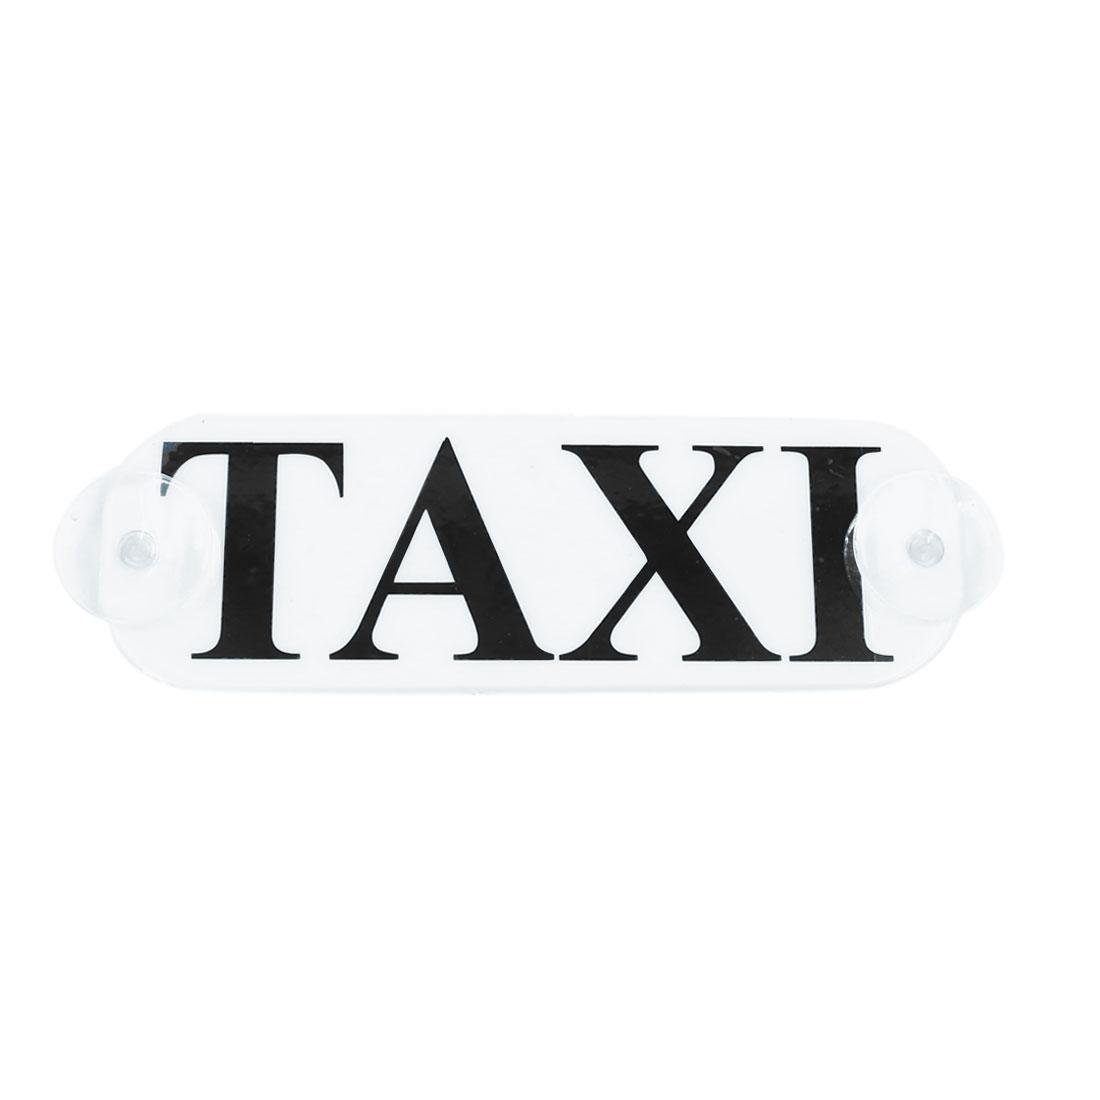 19cm x 6.5cm White Plastic Taxi Pattern Car Decorative Plate w Suction Cups